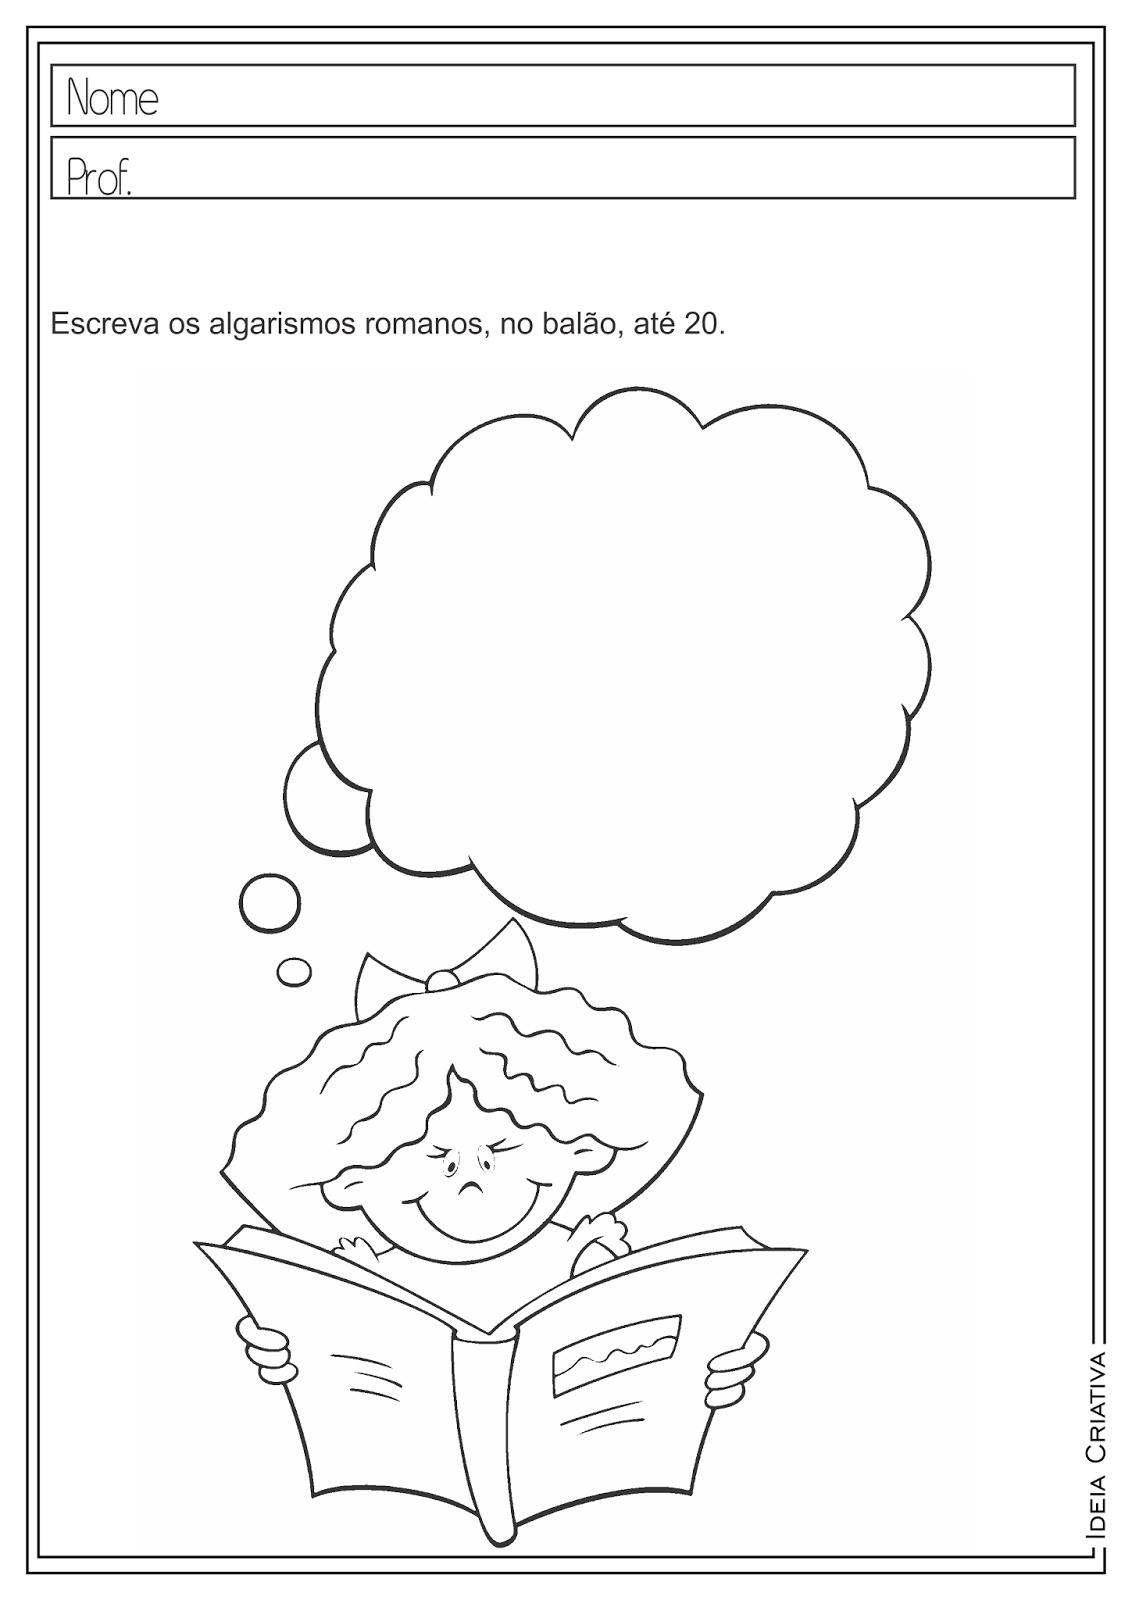 Atividades Educativas Matemática Algarismos Romanos para Ensino Fundamental